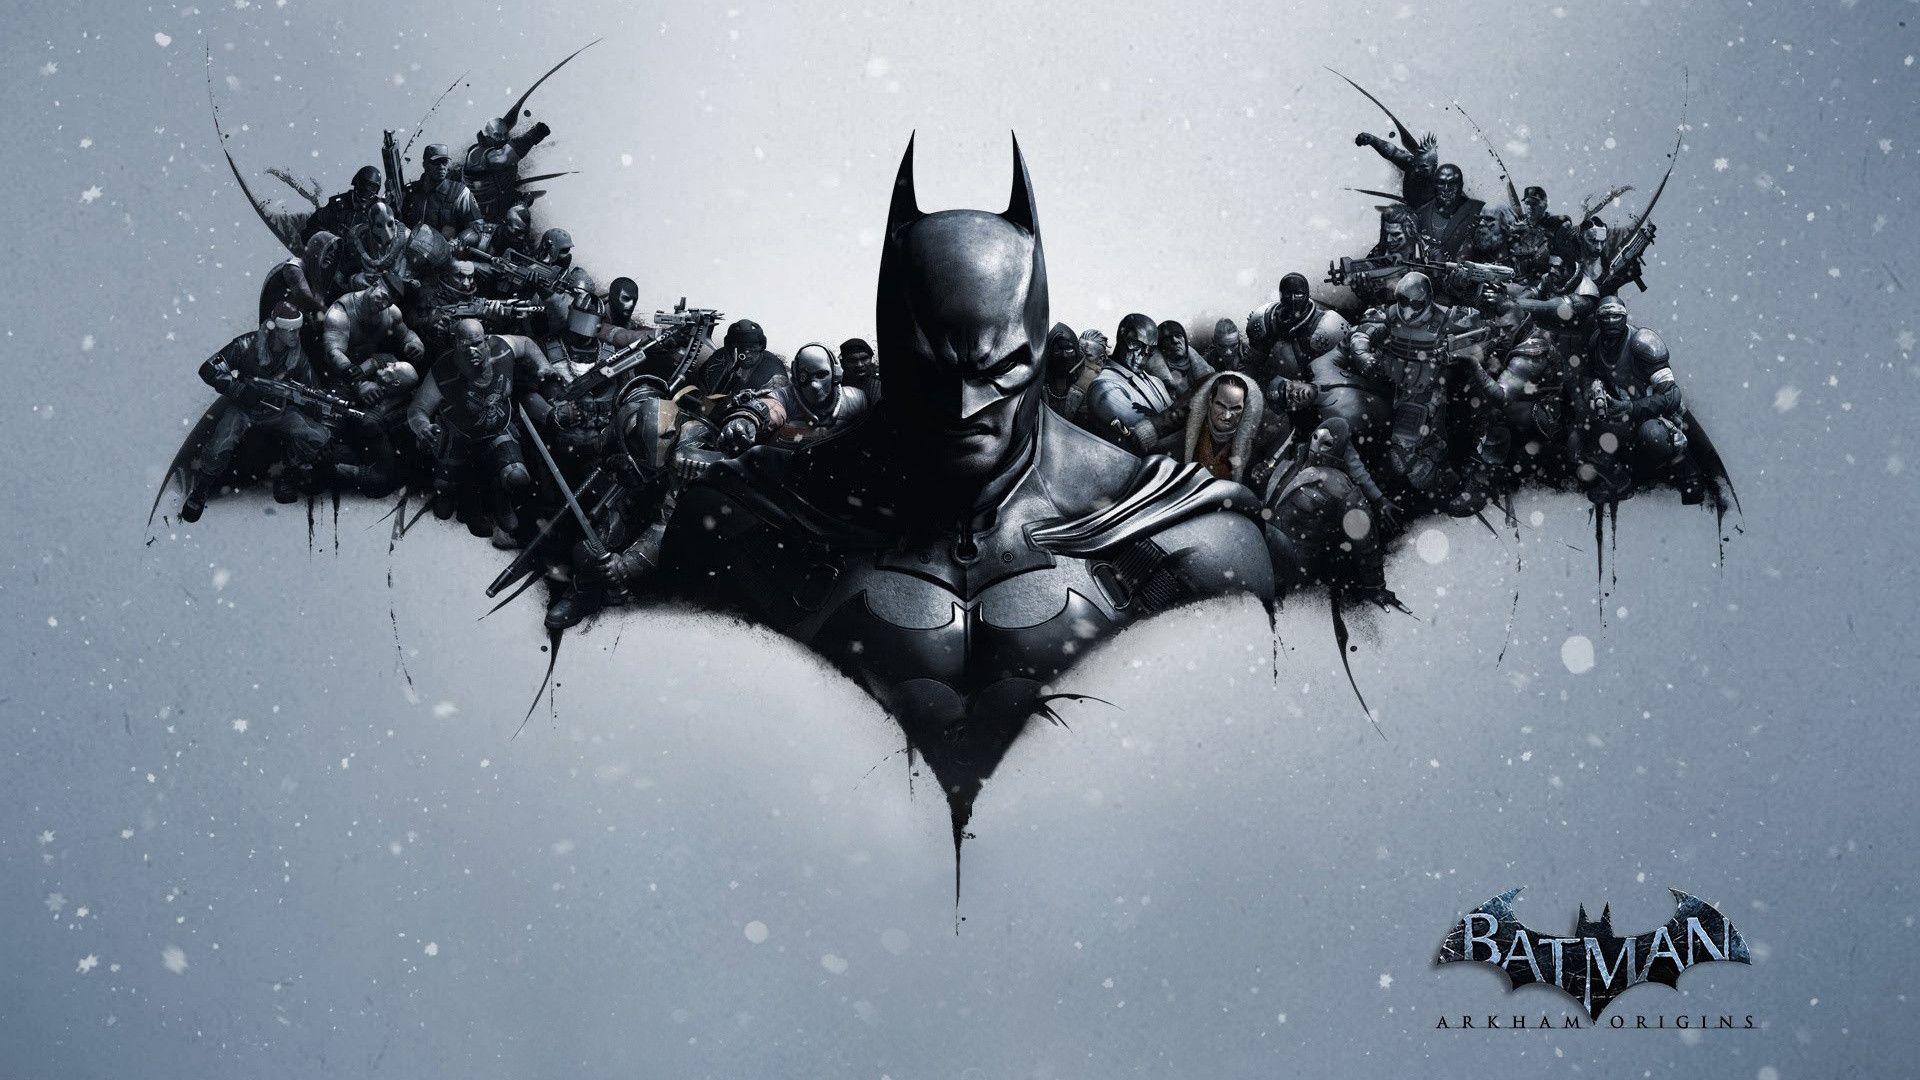 Batman Arkham Origins Video Game Wallpapers